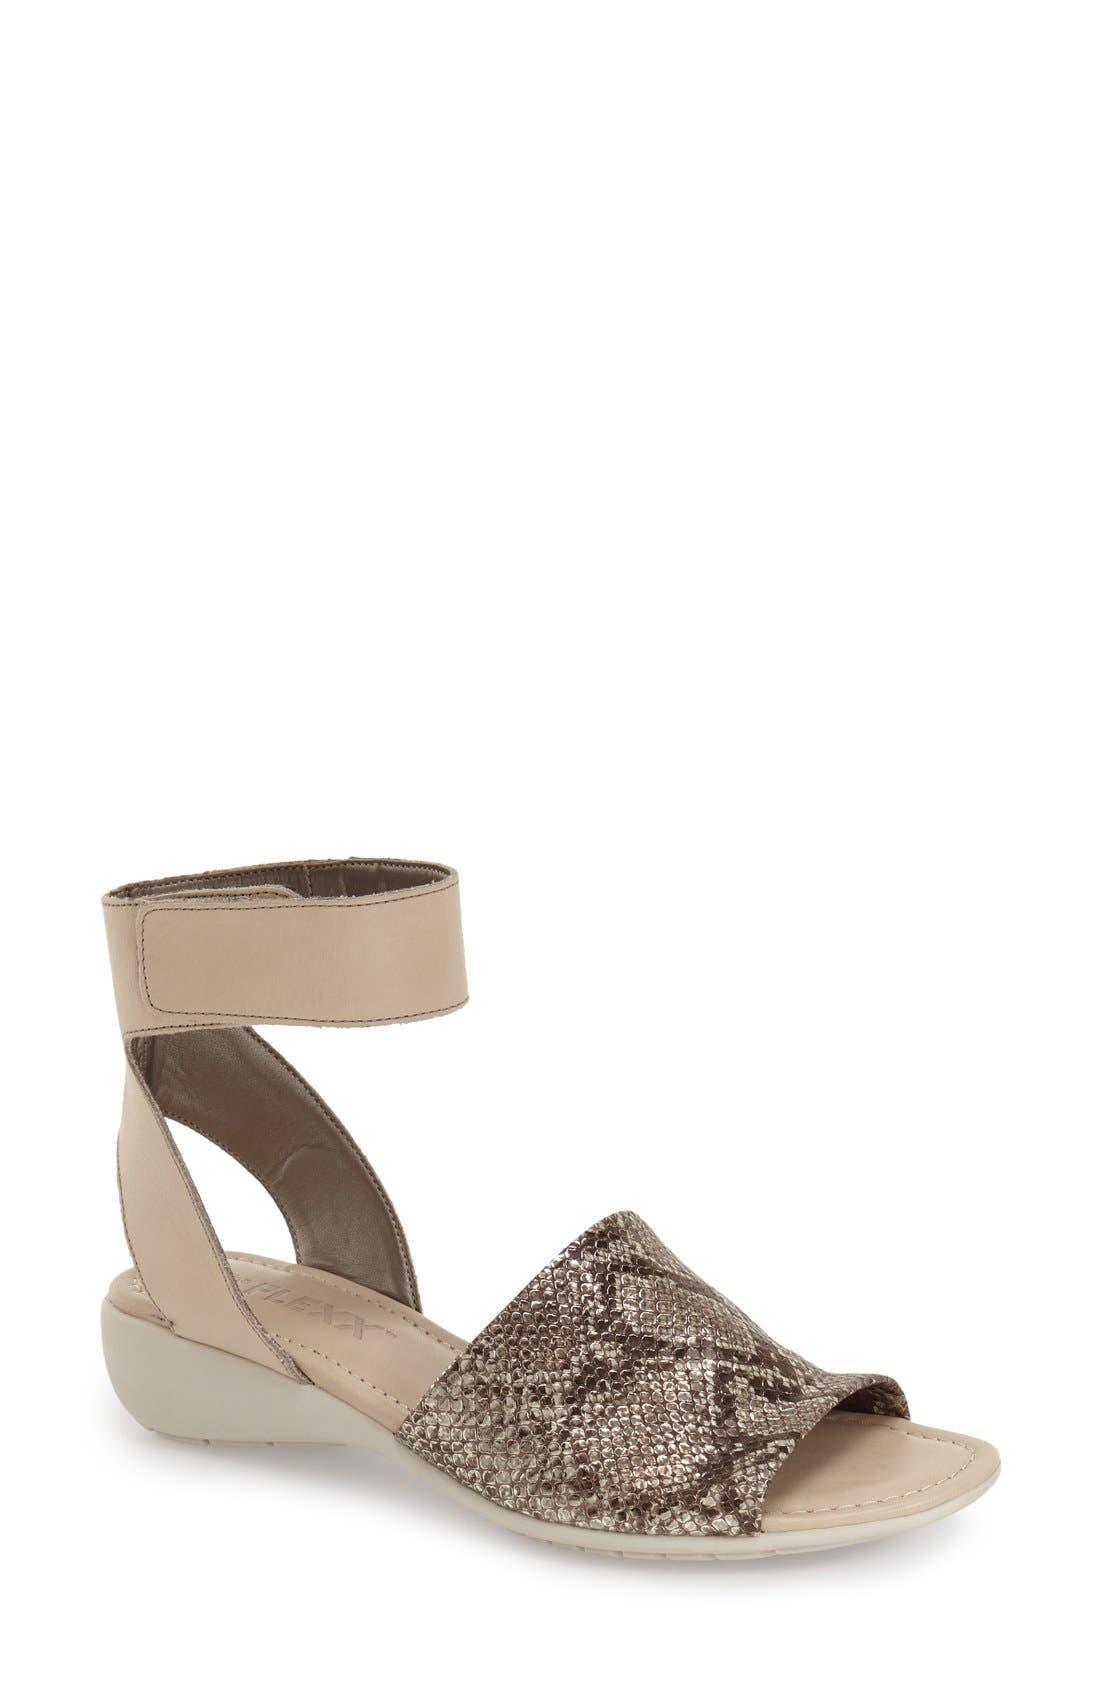 'Beglad' Leather Ankle Strap Sandal,                             Main thumbnail 15, color,